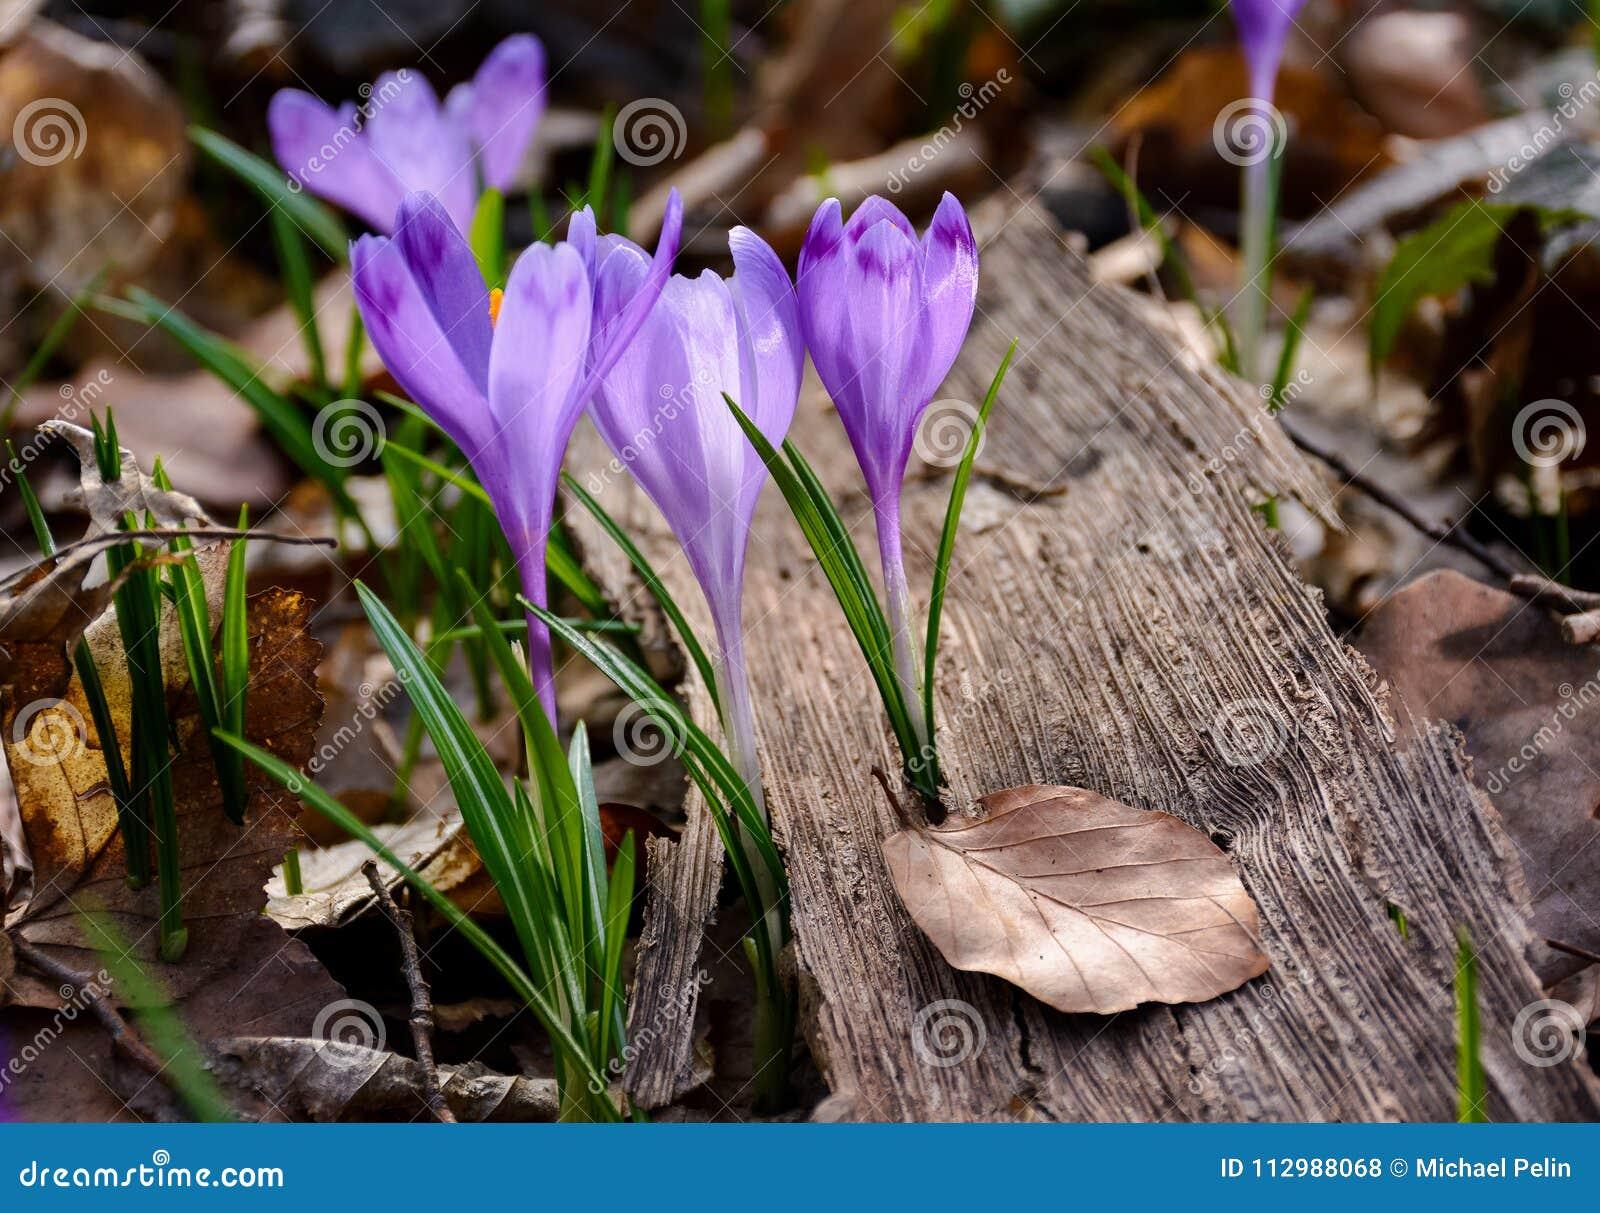 Purple crocus flowers among the weathered foliage